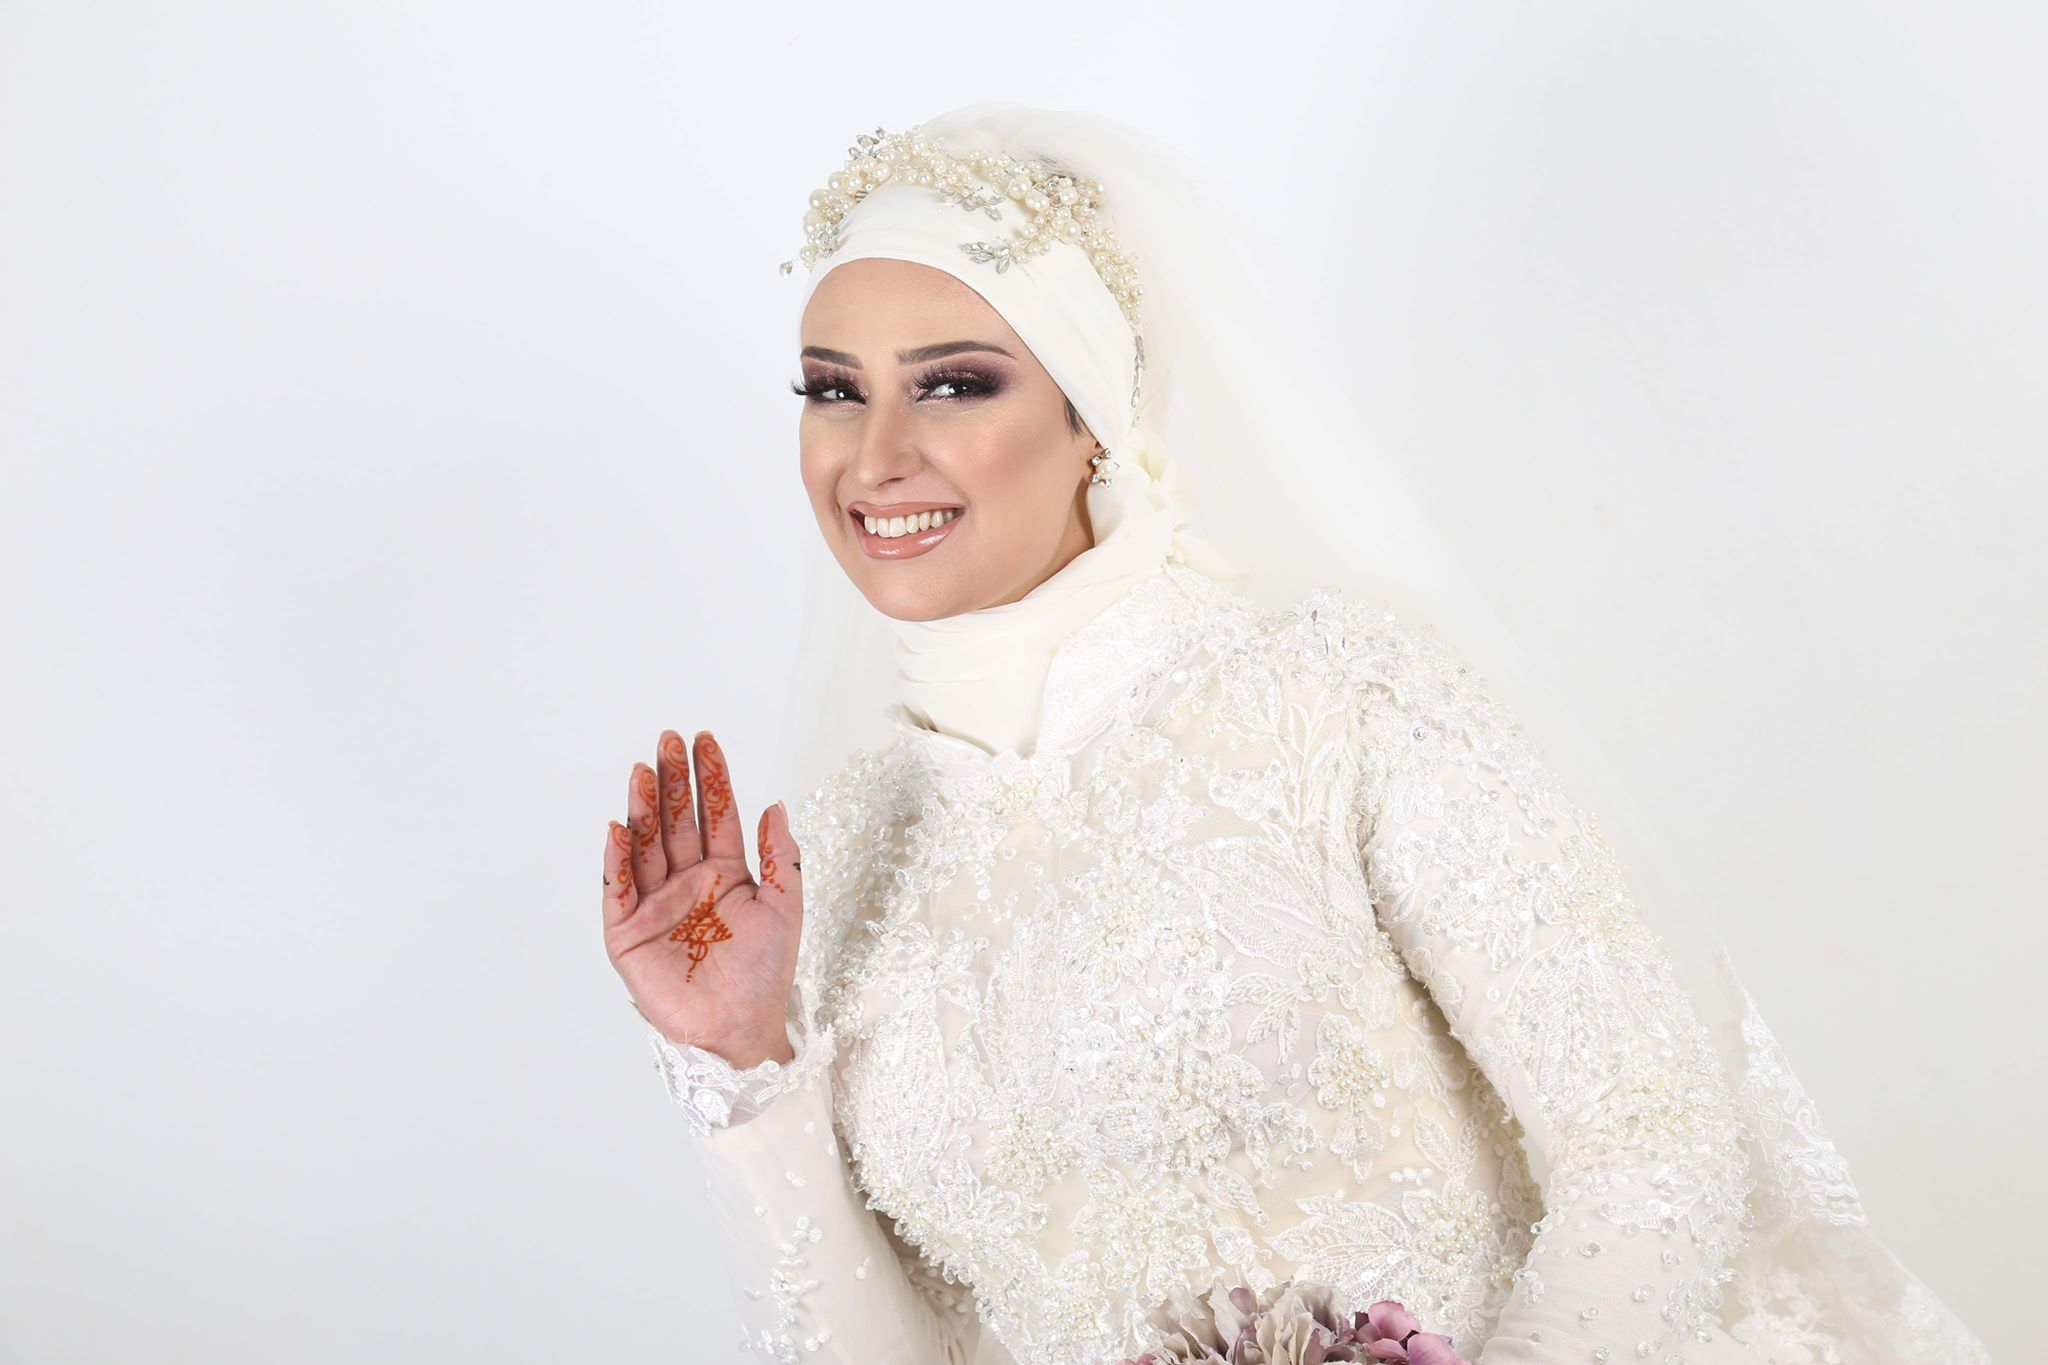 Tesnim_M7_plus_belles_mariées_tunisiennes2019